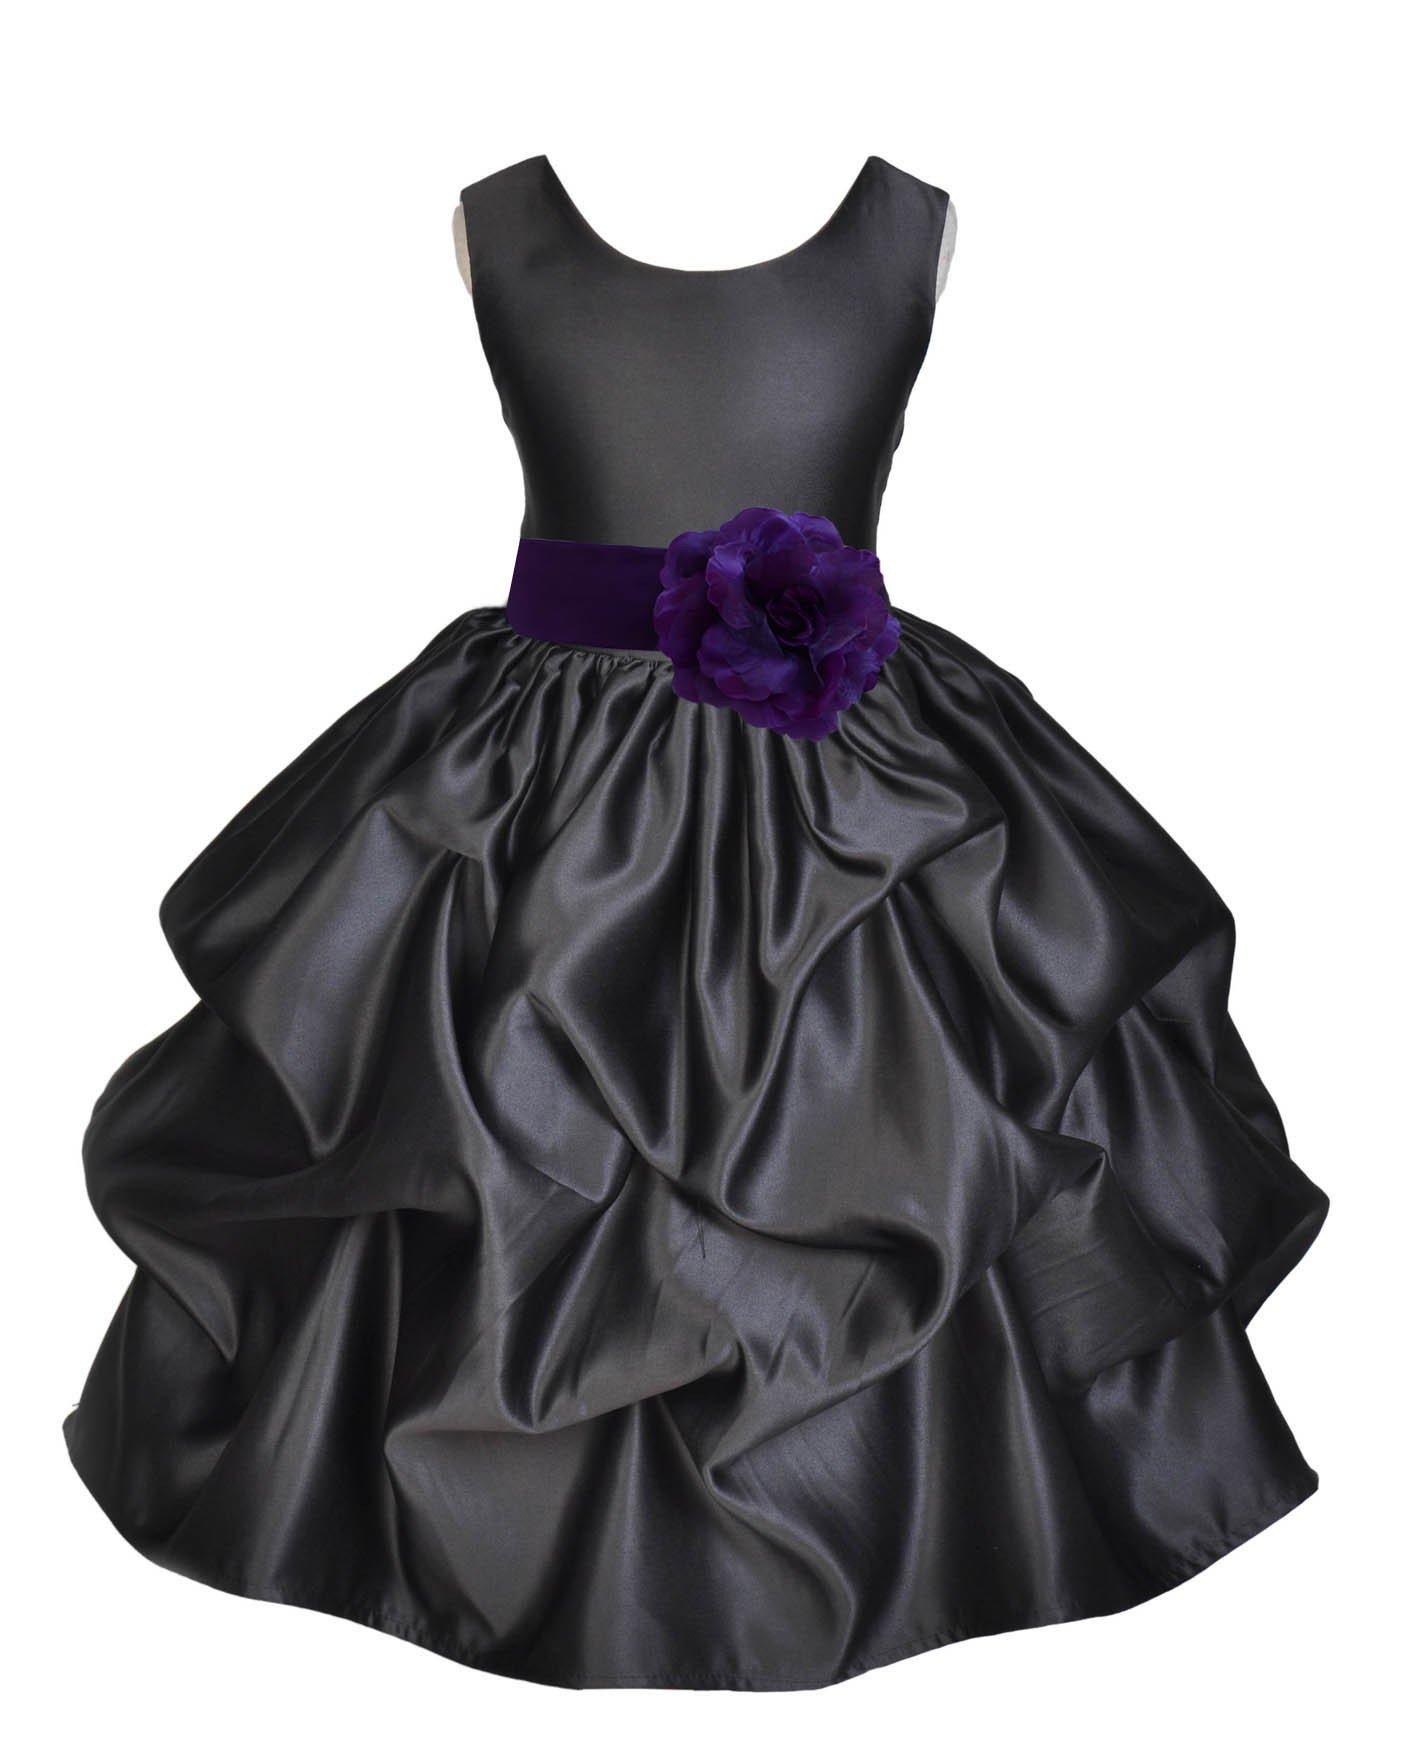 ekidsbridal Black Pick-Up Satin Bubble Flower Girl Dress Ballroom Dance Dresses 208T 2 by ekidsbridal (Image #2)